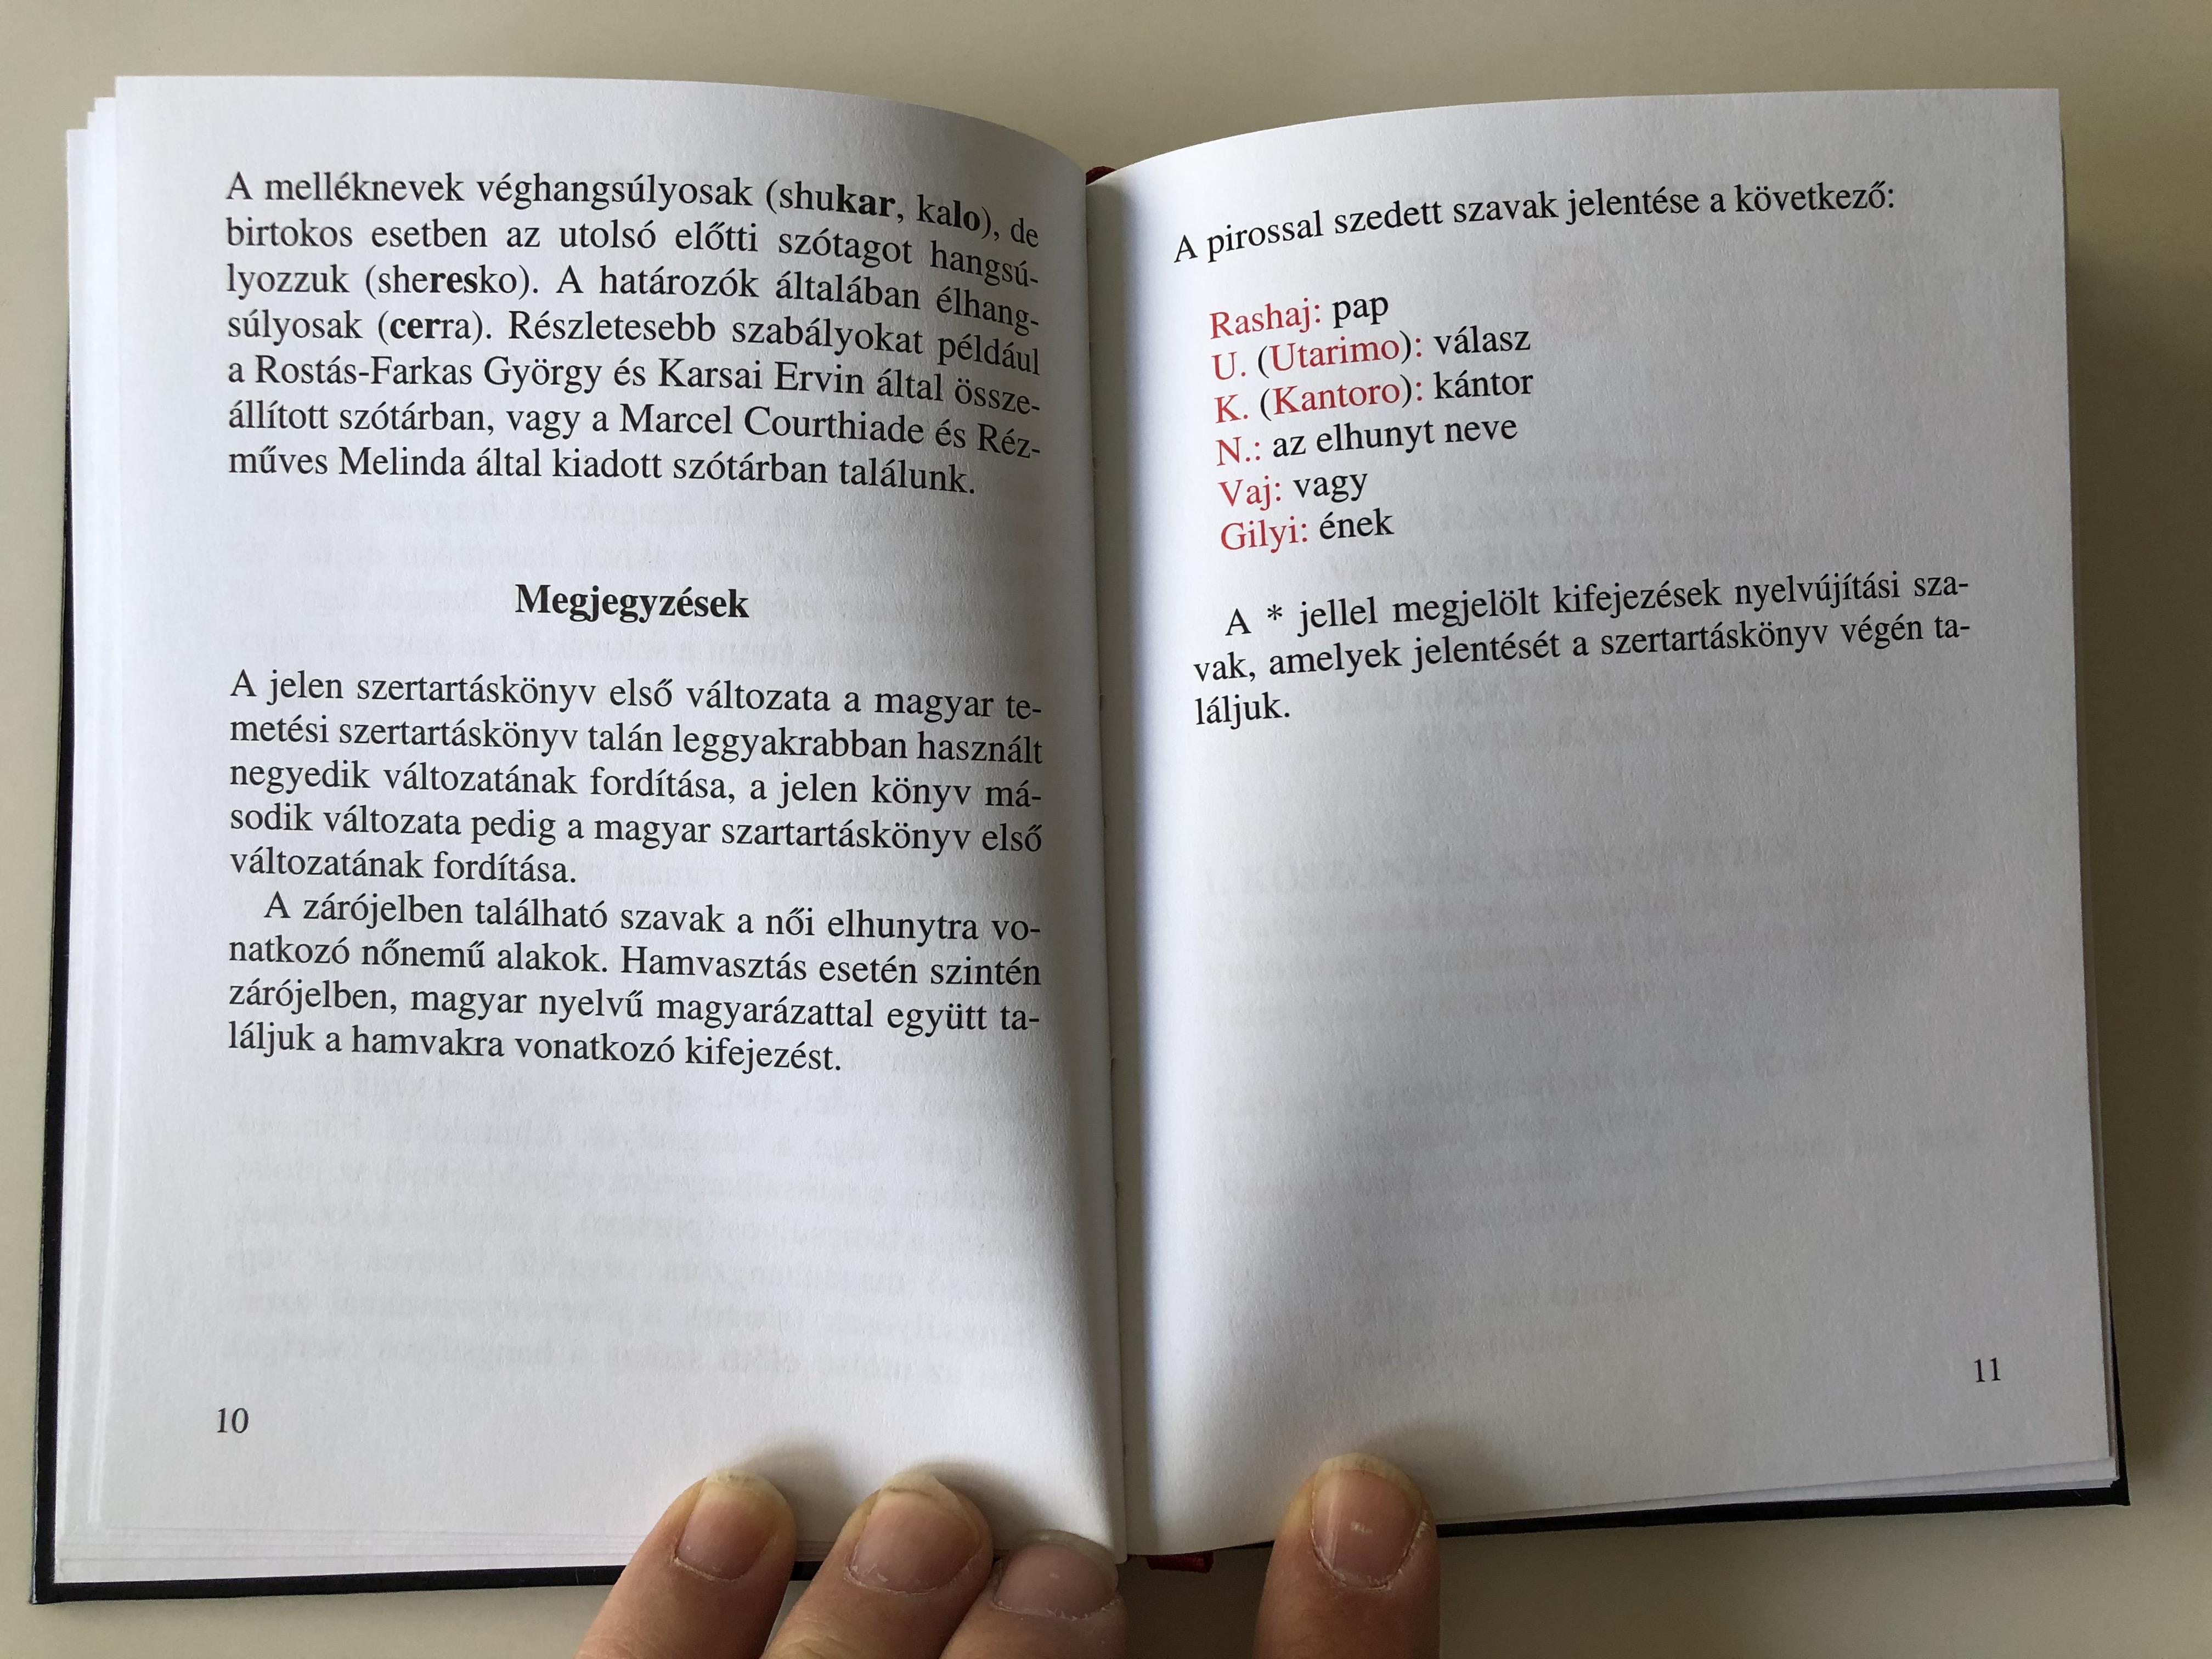 temet-si-szertart-sk-nyv-lovari-nyelven-6.jpg